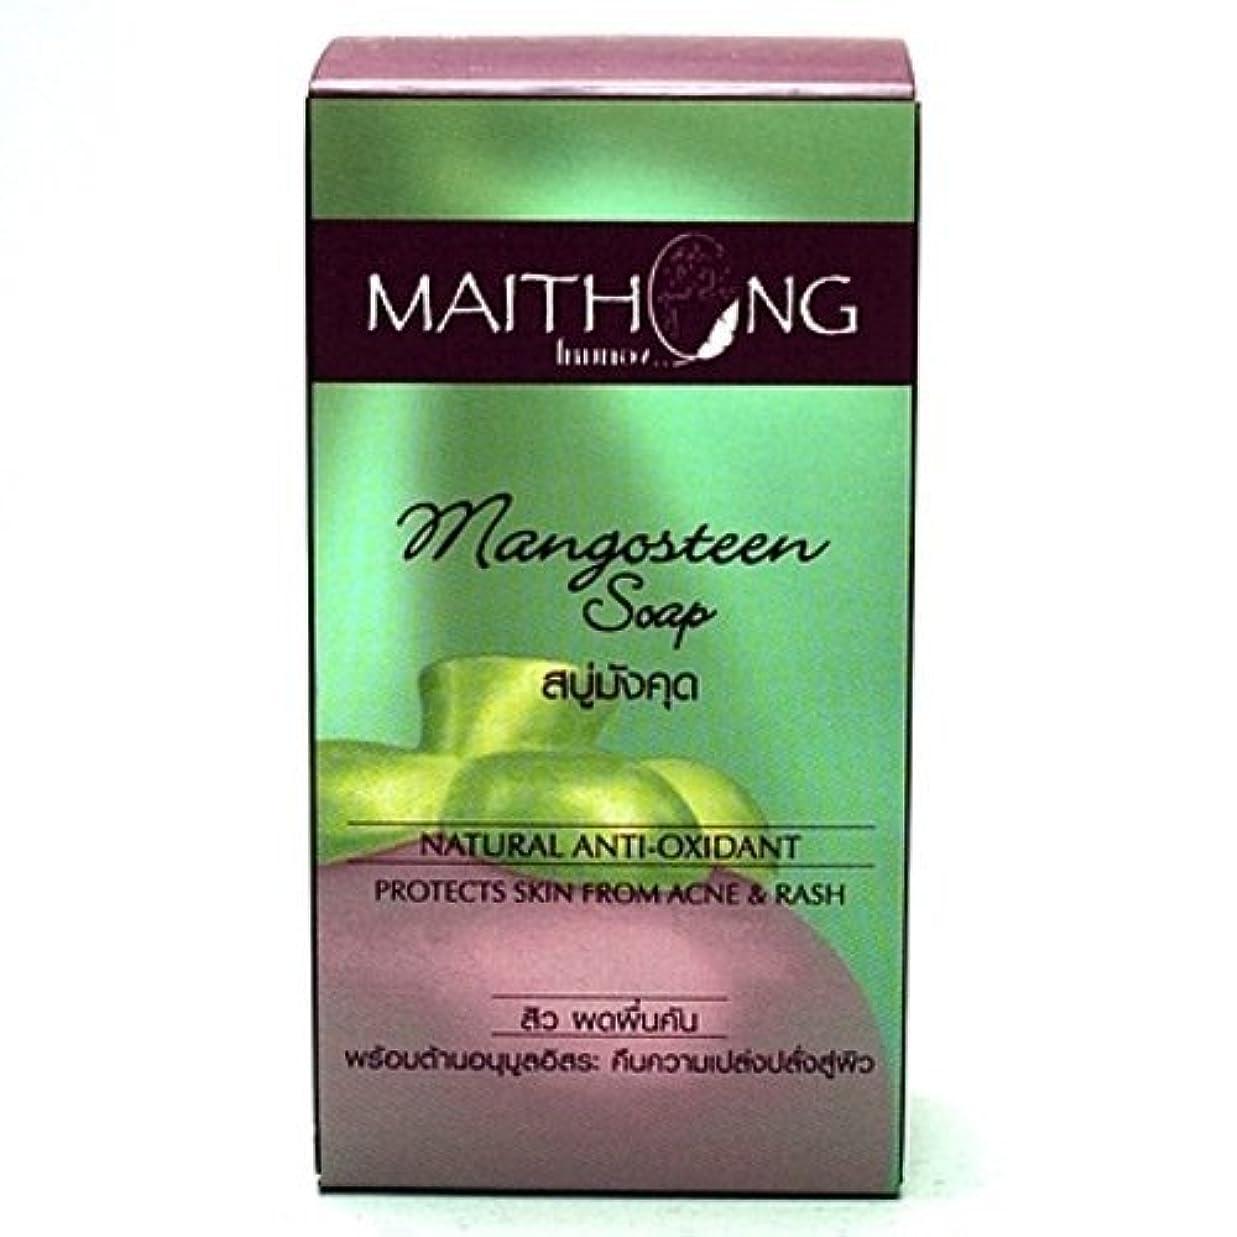 Mangosteen Soap Face and Body Wash Acne Rash Black Spot Spa Facial Soap Bar Natural Herb Scent by Maithong